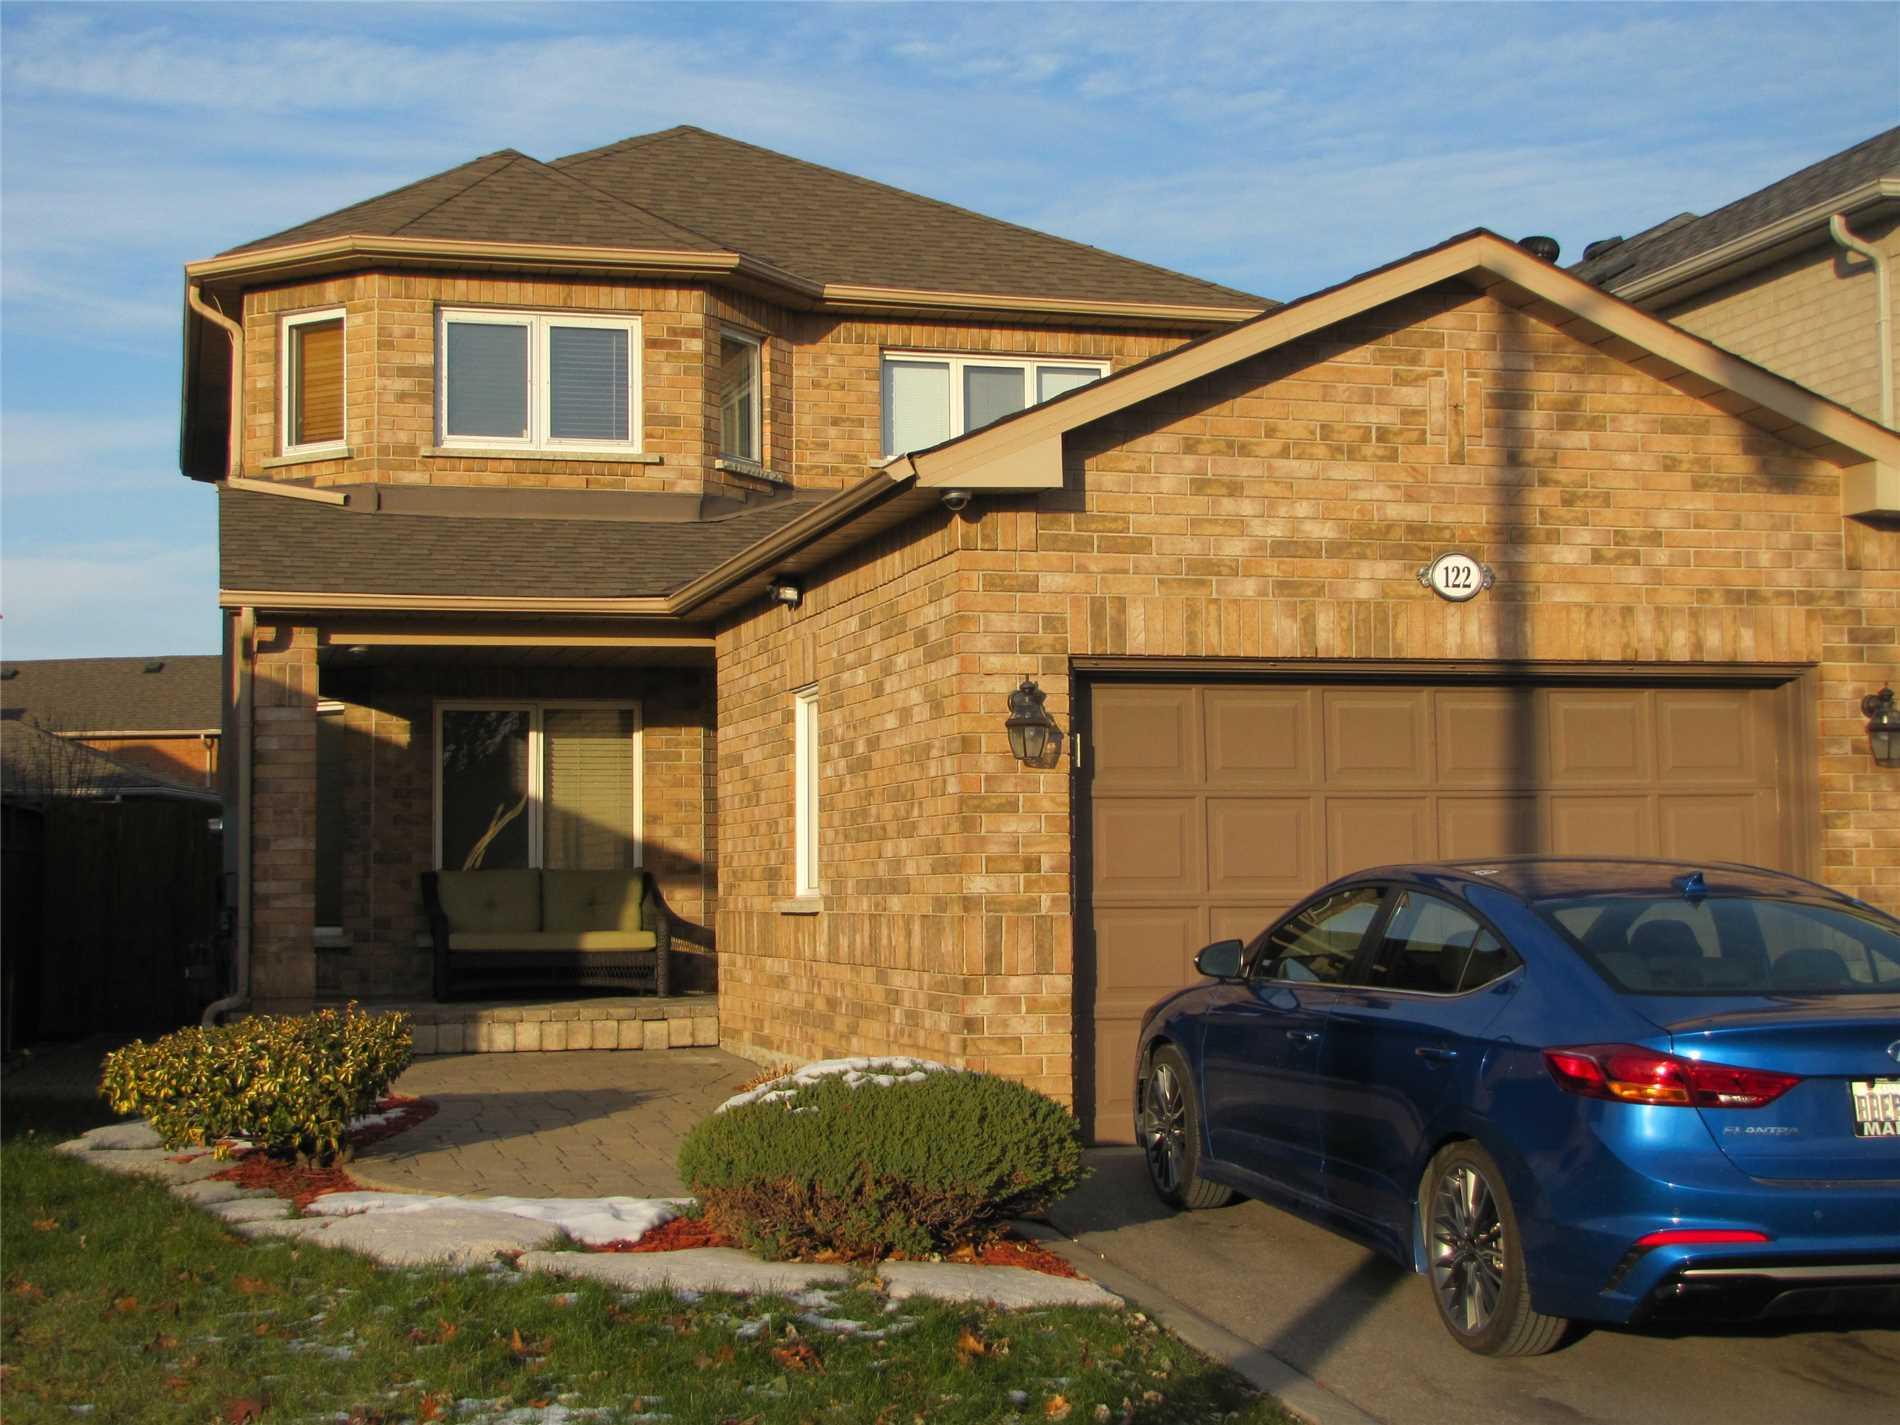 House for sale at 122 Royalpark Way Vaughan Ontario - MLS: N4311108